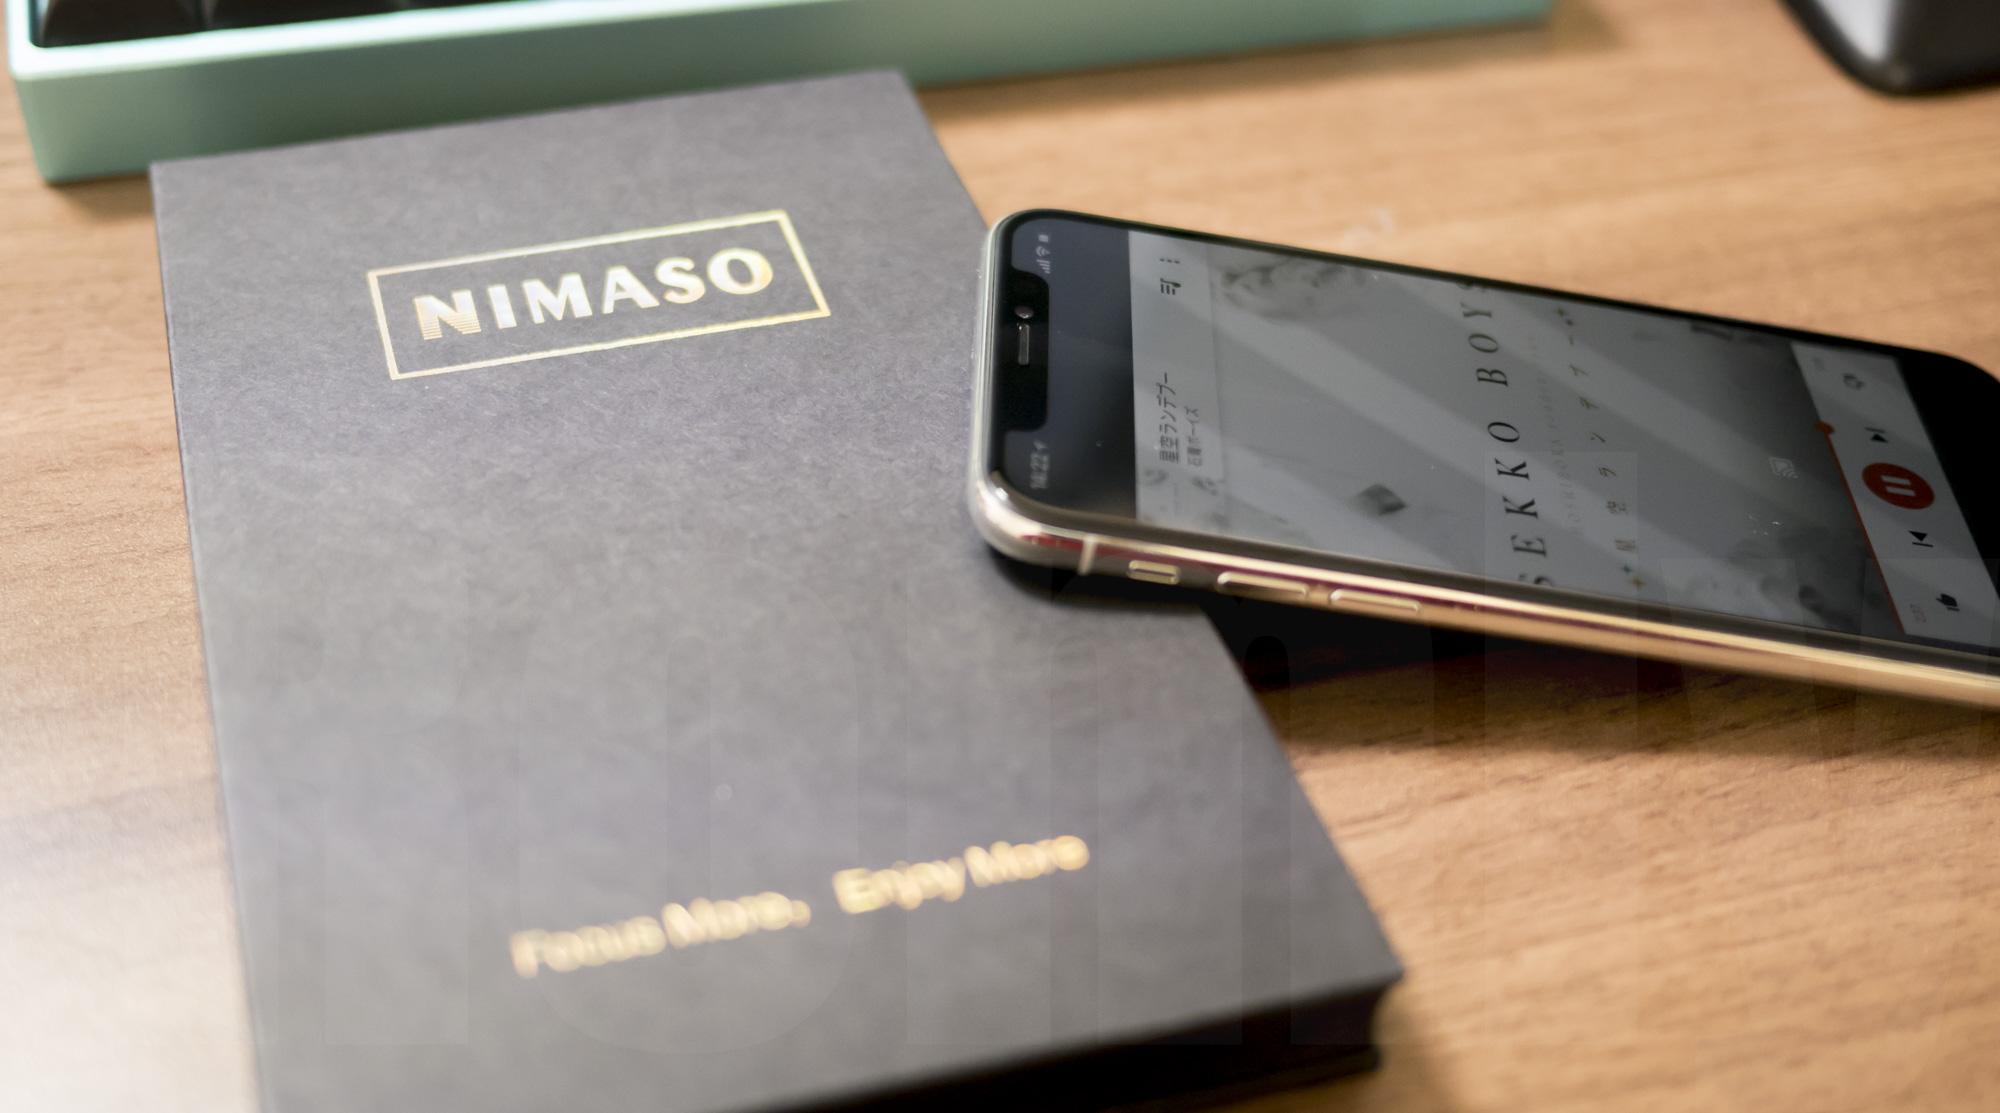 NIMASO iPhone X 強化ガラス保護フィルム